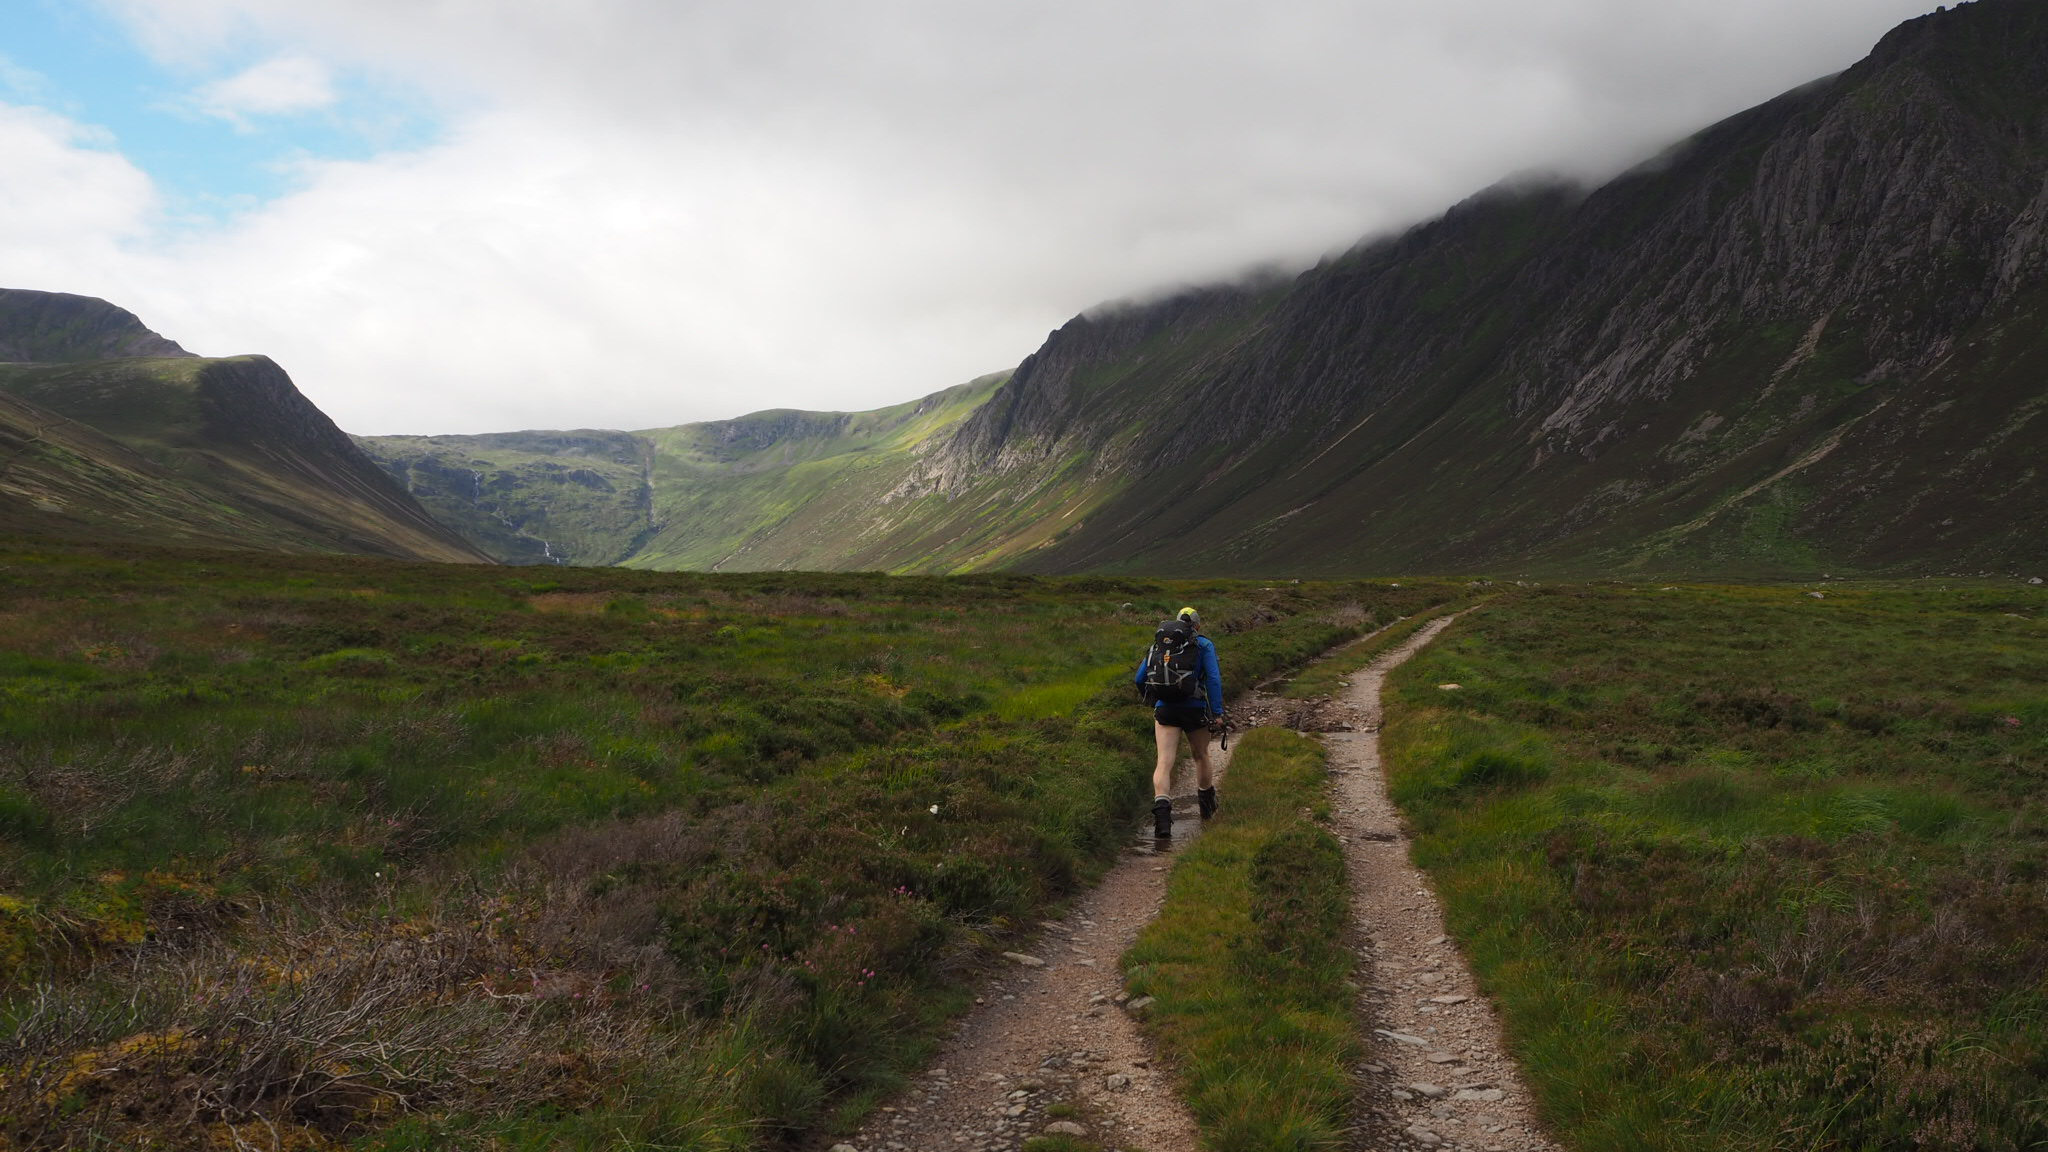 Caledonian Sleeper Cairngorms Scotland Adventure